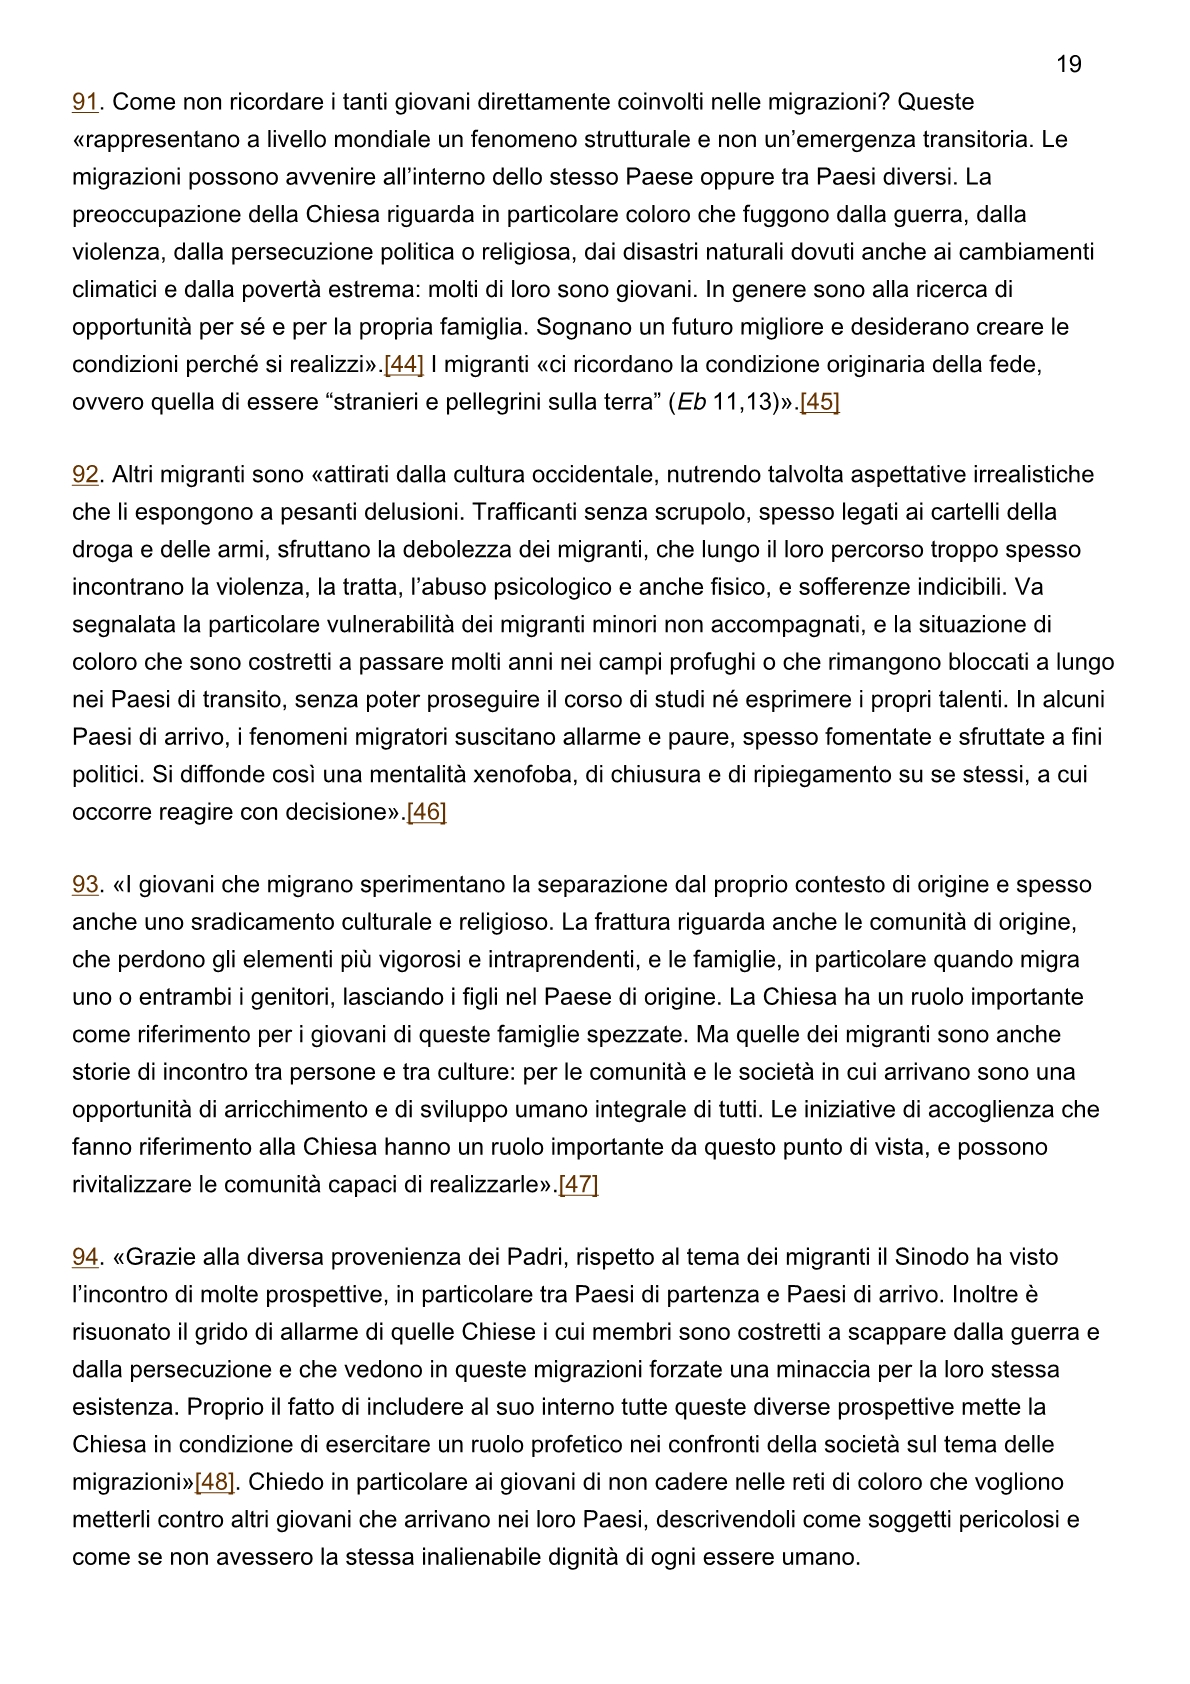 papa-francesco_esortazione-ap_20190325_christus-vivit19